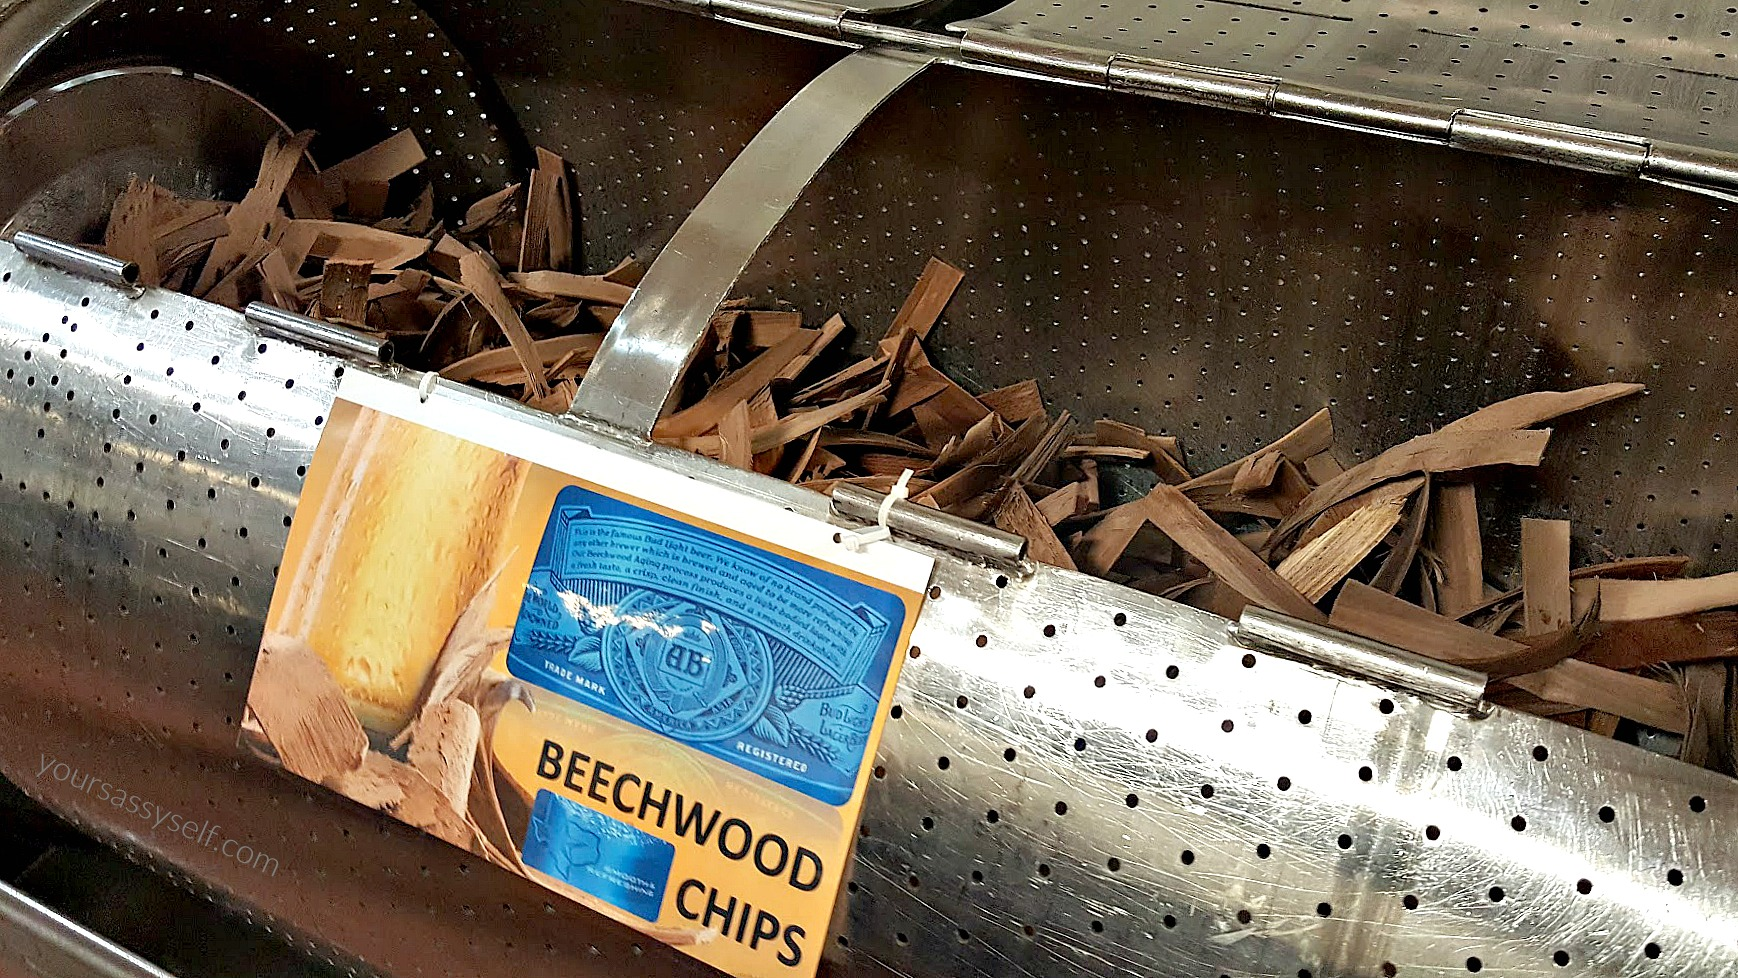 Bud Light Beechwood Chips - yoursassyself.com